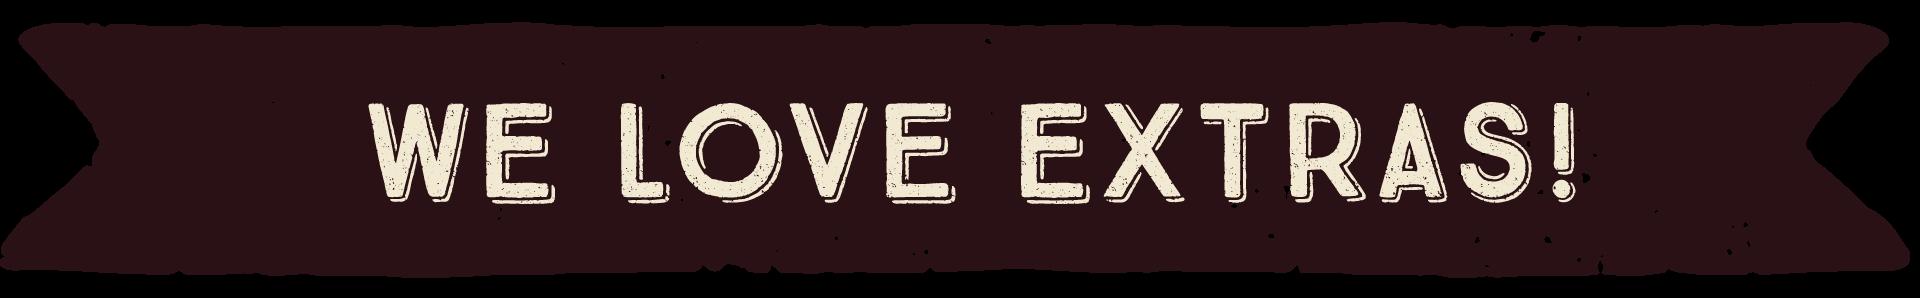 extras-banner-v1